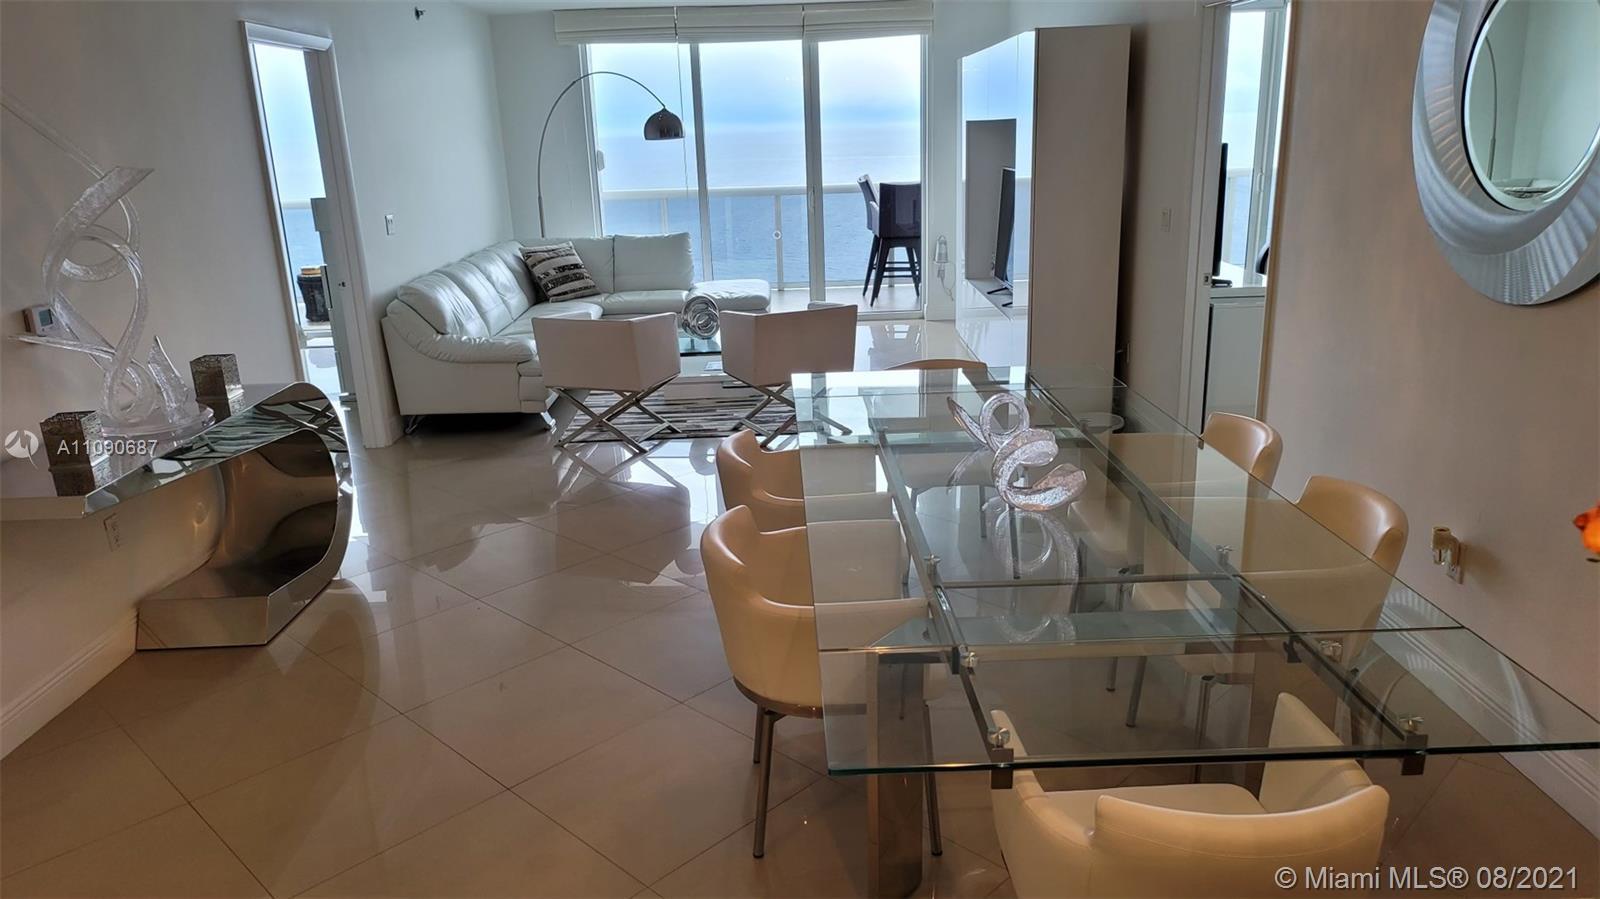 very nice 3 bed 3 bath in Hallandale , beach club condo 3 , 32 floor direct ocean view, tile all thr